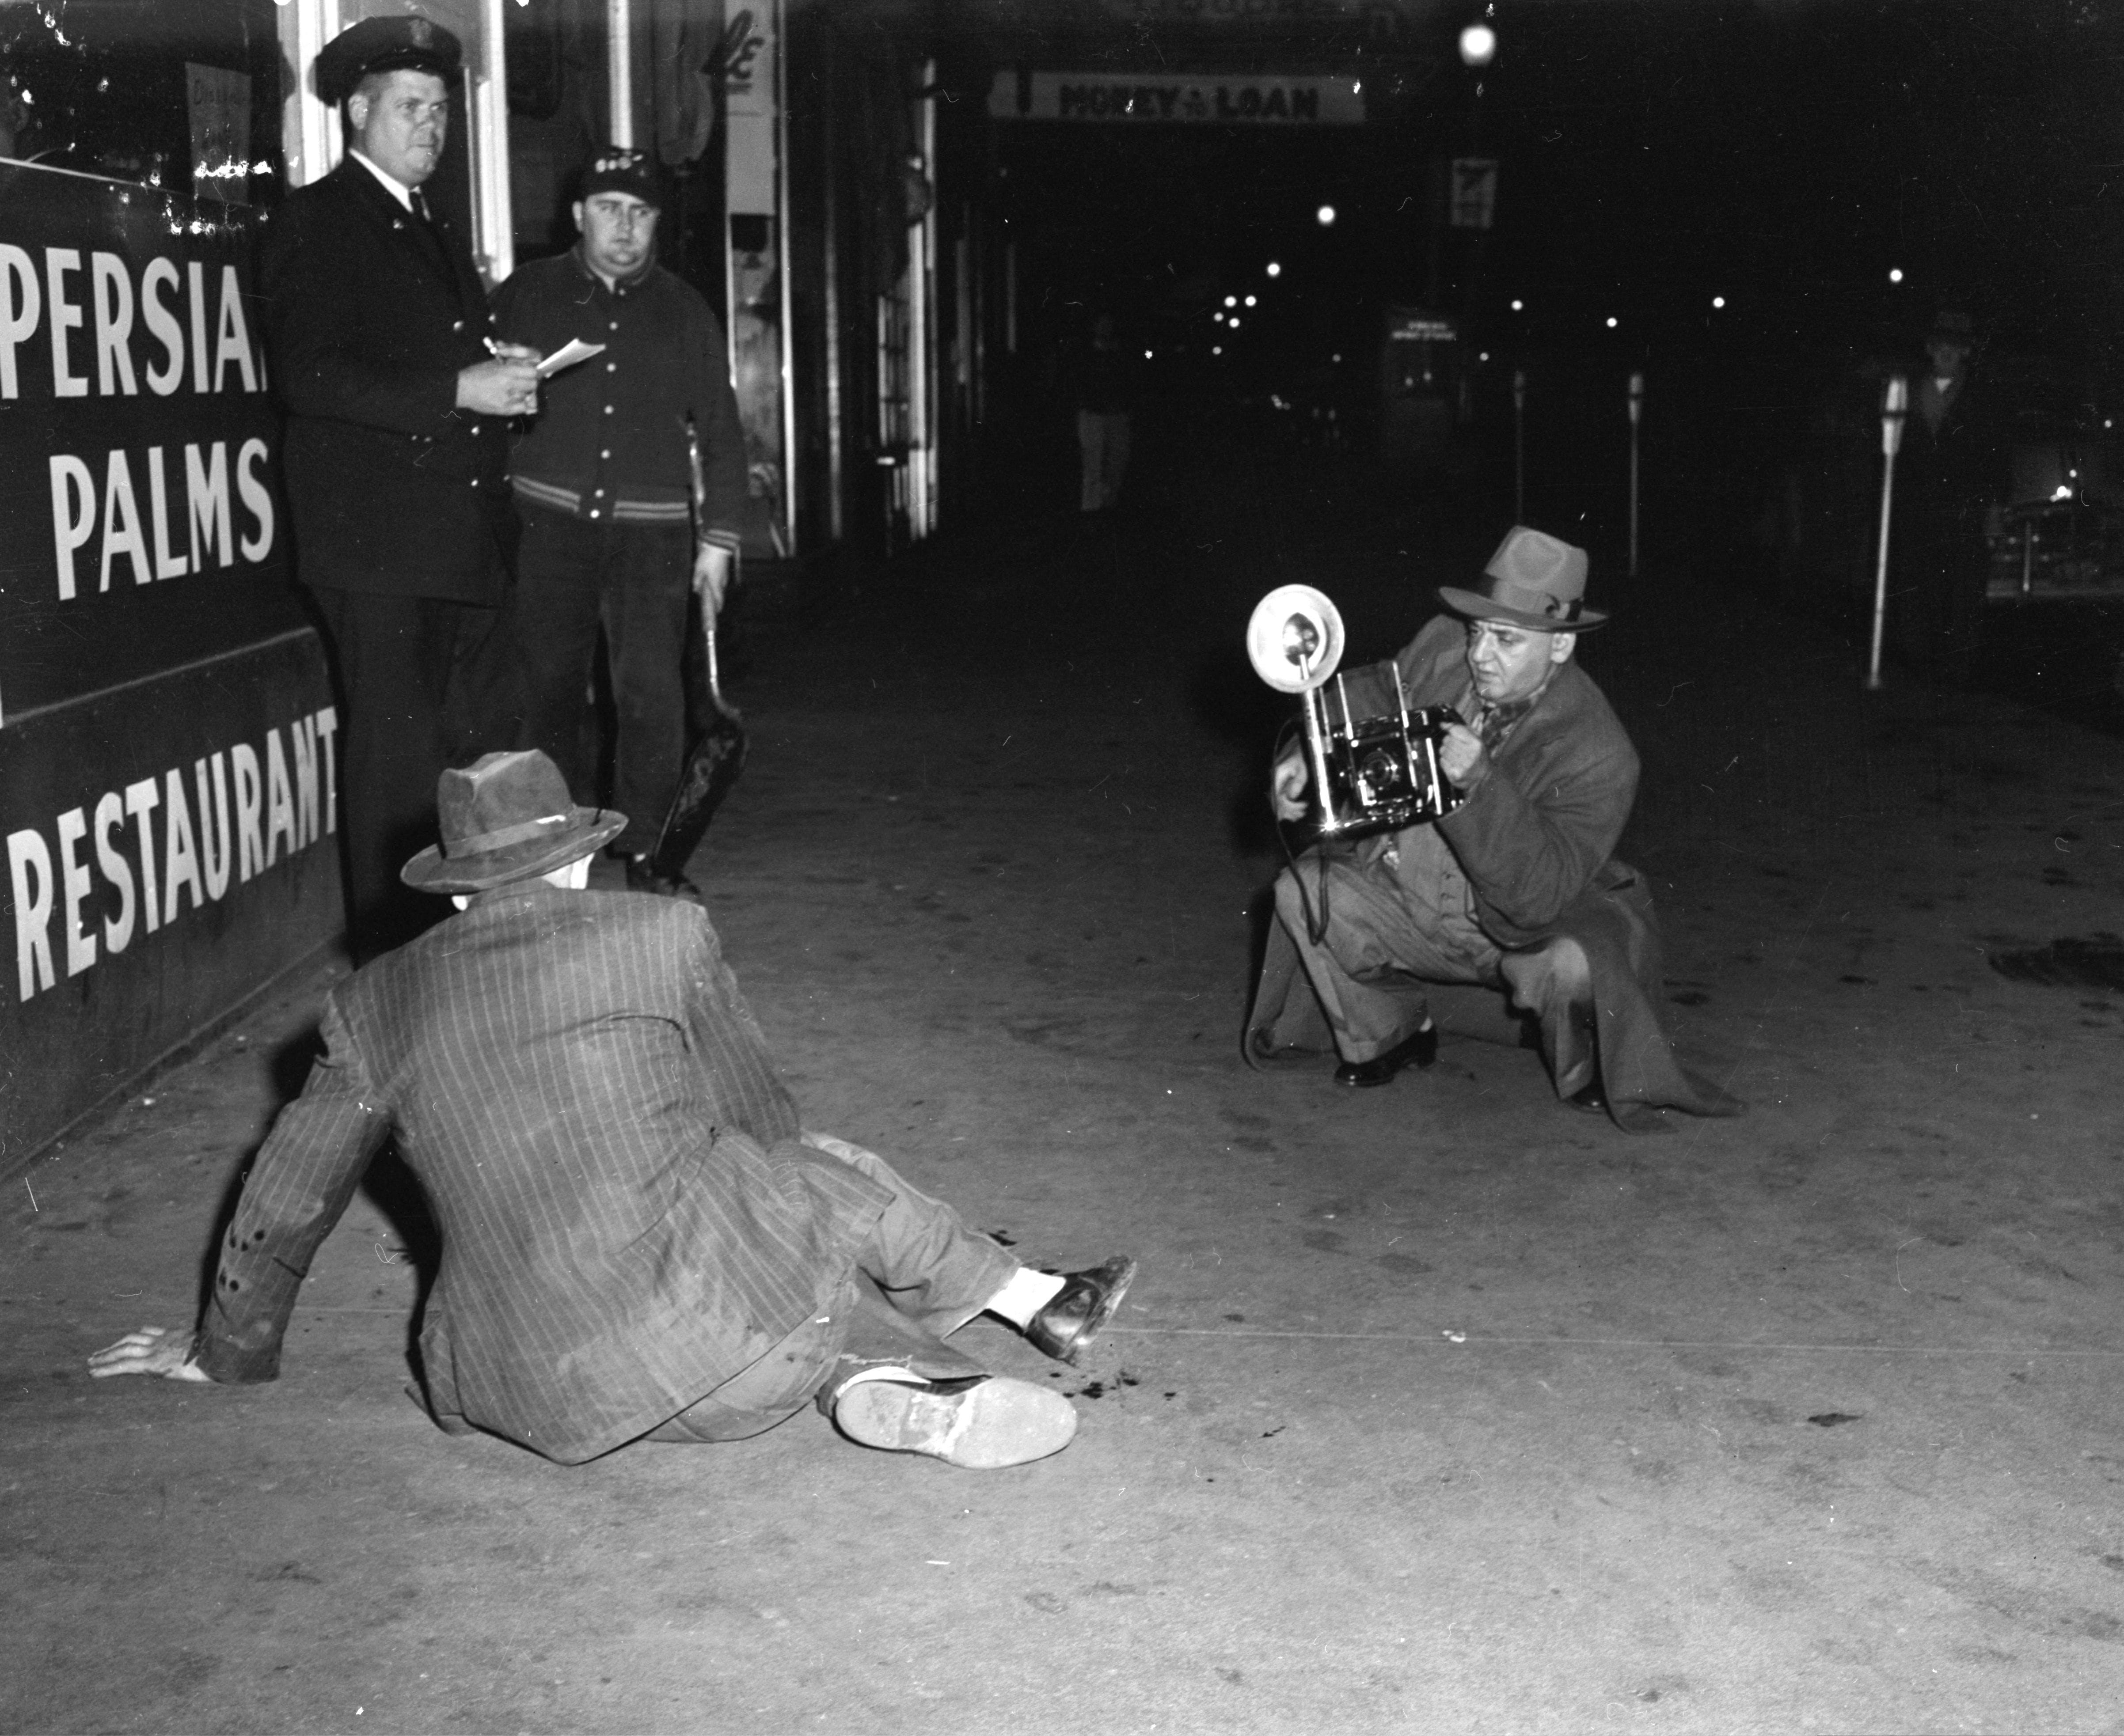 Crime Scene Shutterbugs of the 20th Century